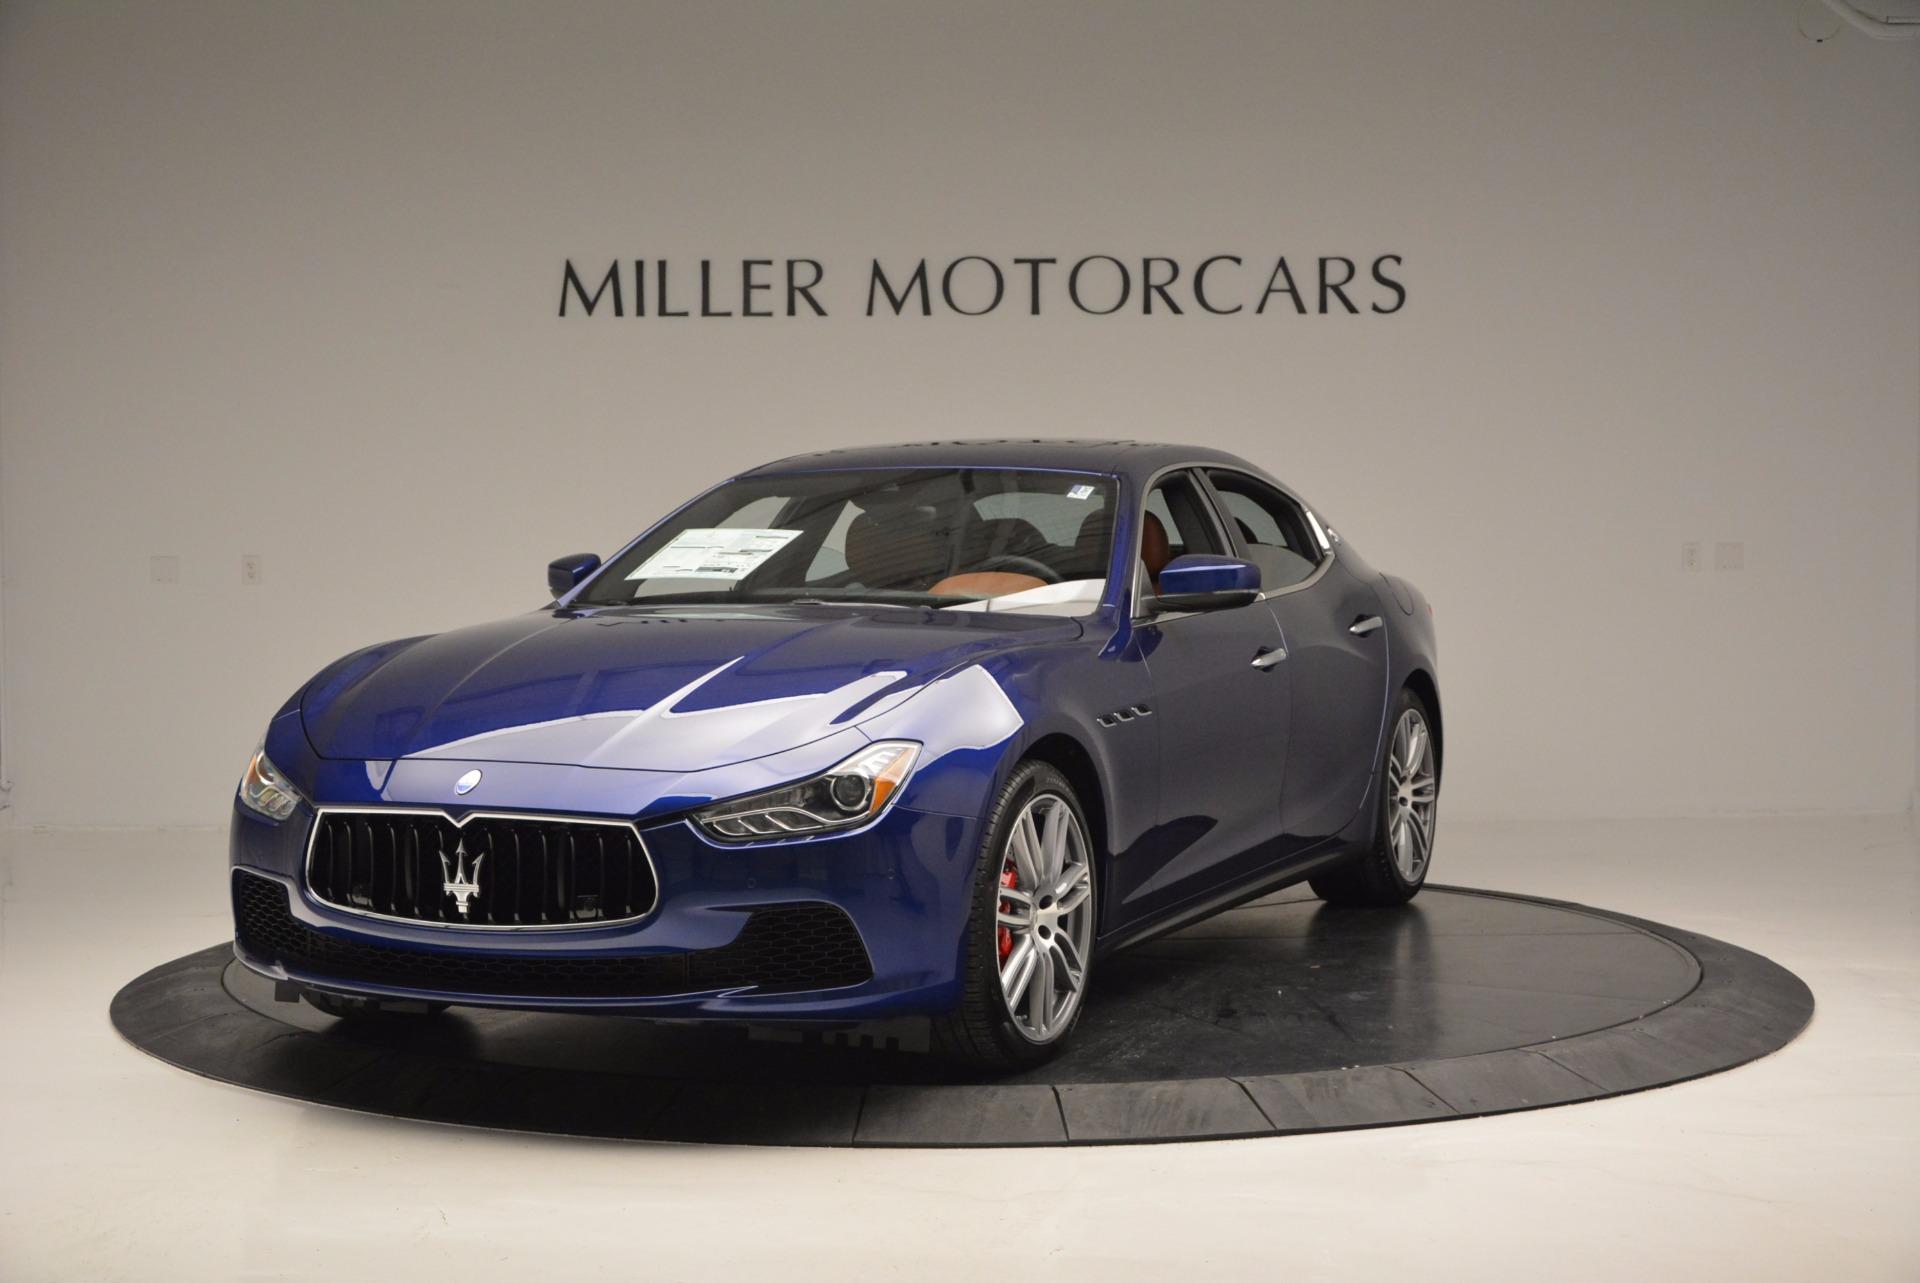 New 2017 Maserati Ghibli S Q4 For Sale In Greenwich, CT 683_main